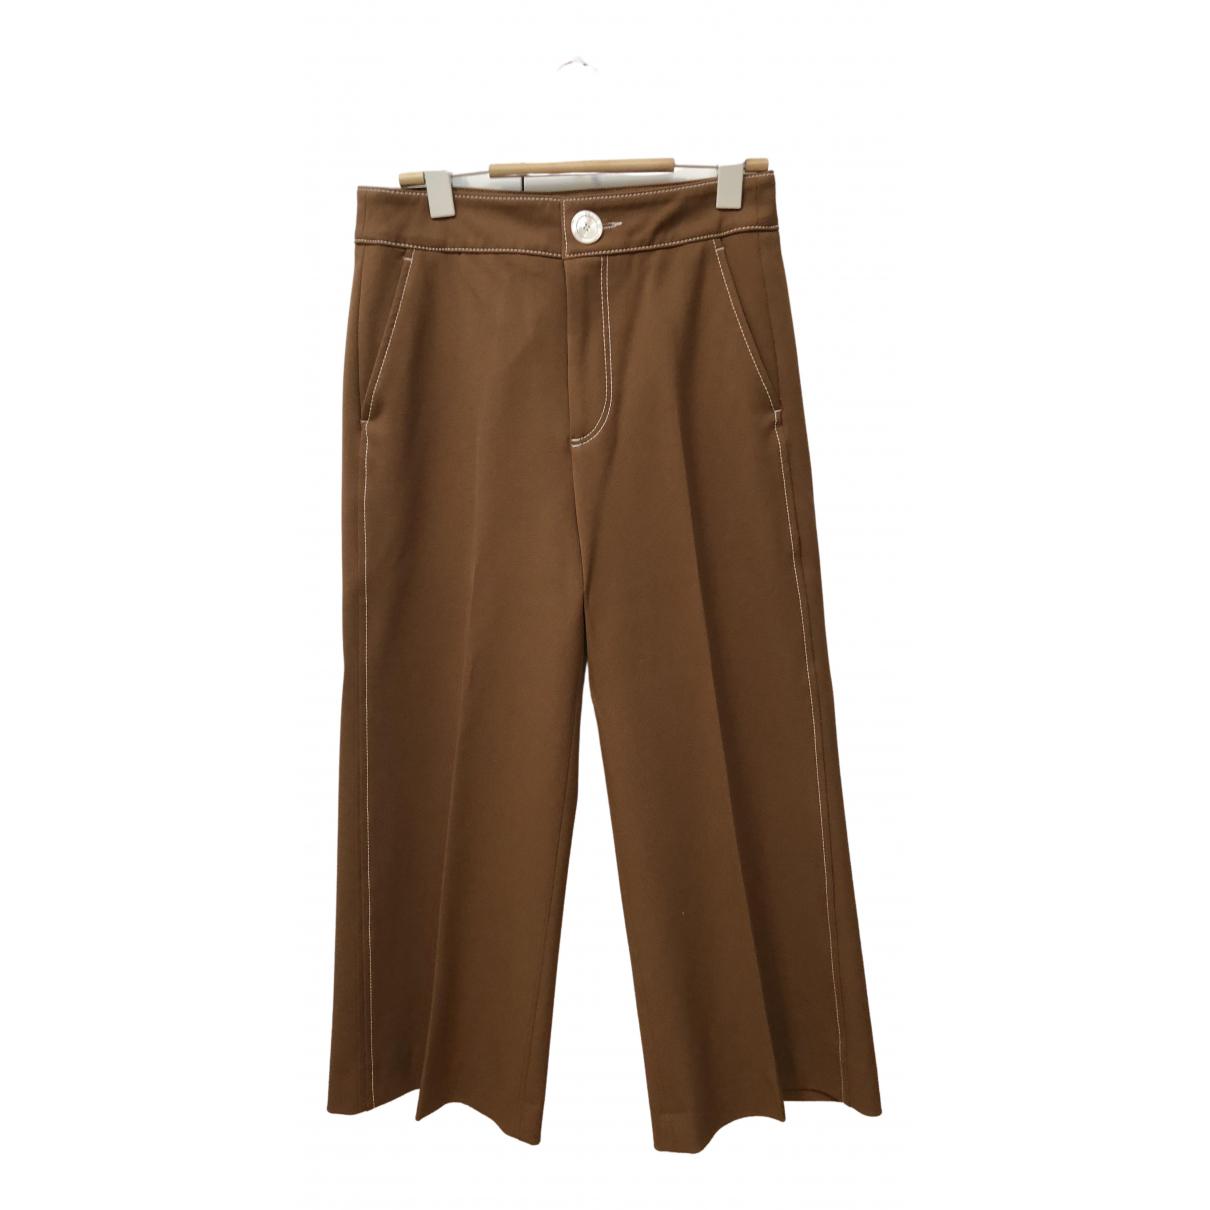 Zara \N Camel Cotton Trousers for Women 34 FR